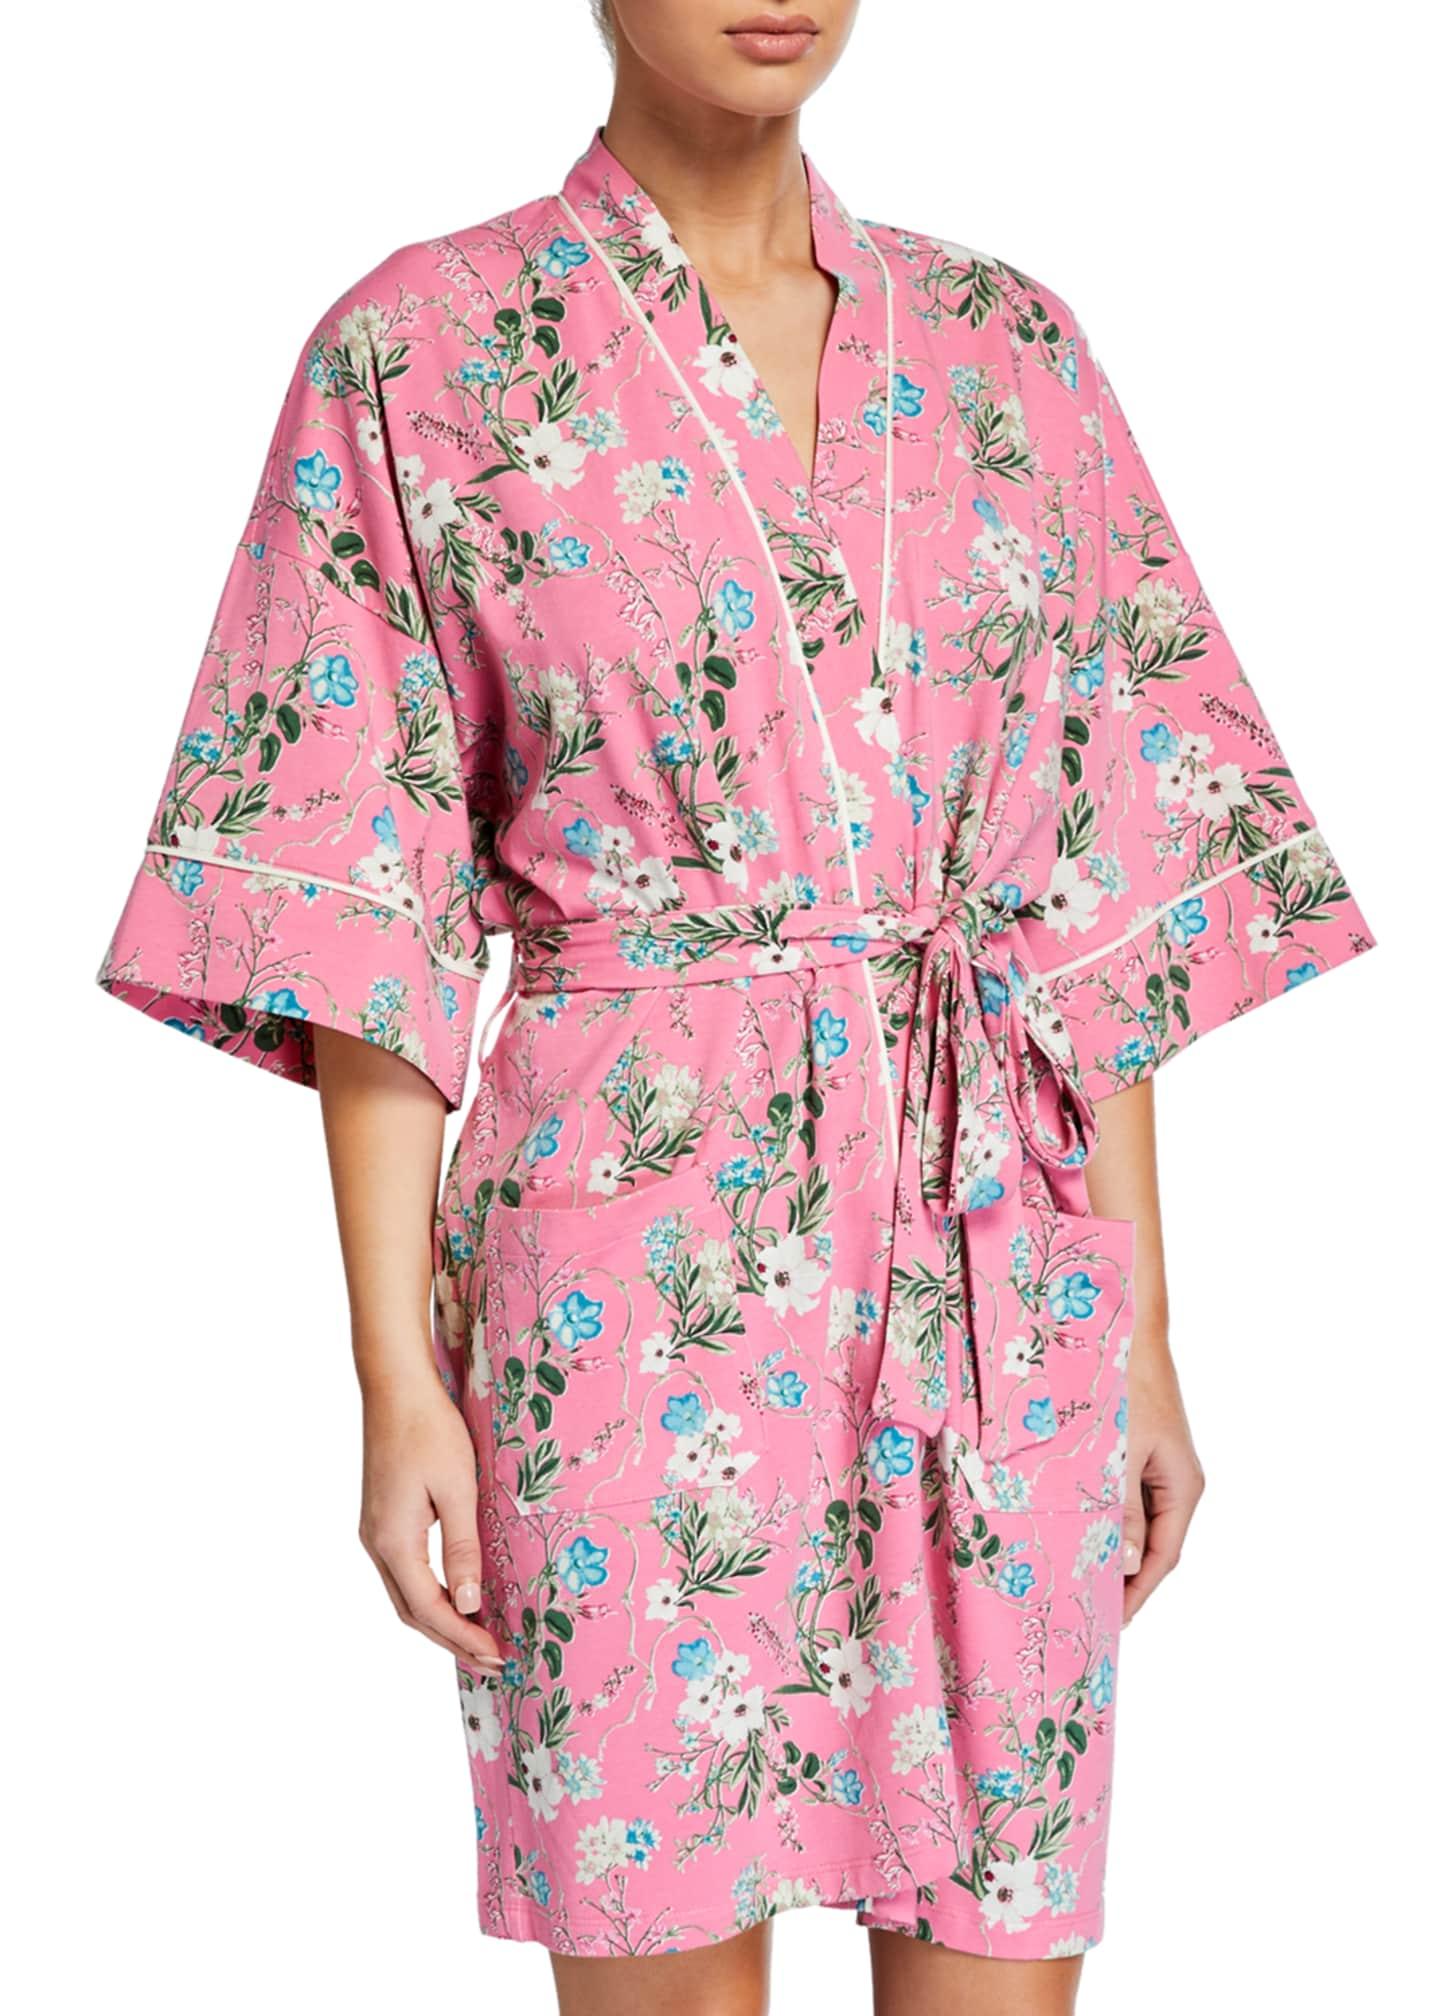 BedHead Pajamas Ladybug Floral Short Kimono Robe